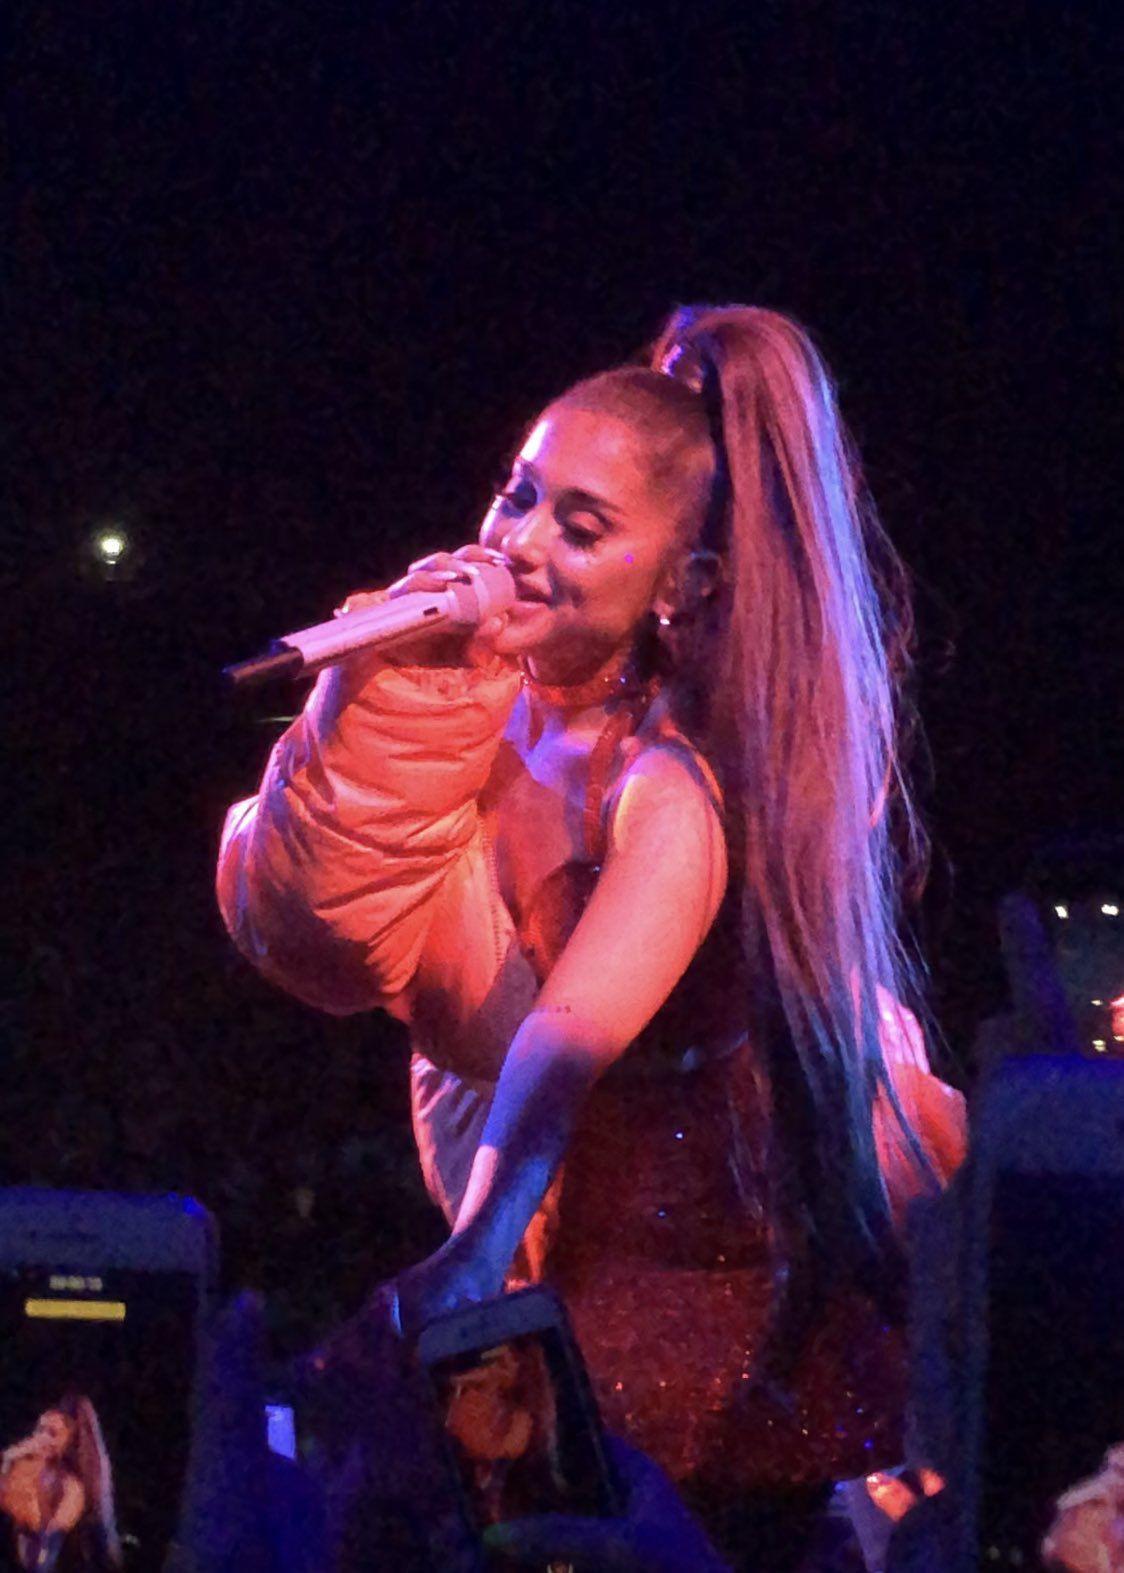 Cute Ariana Grande's Outfits, Ariana Grande, Rock concert